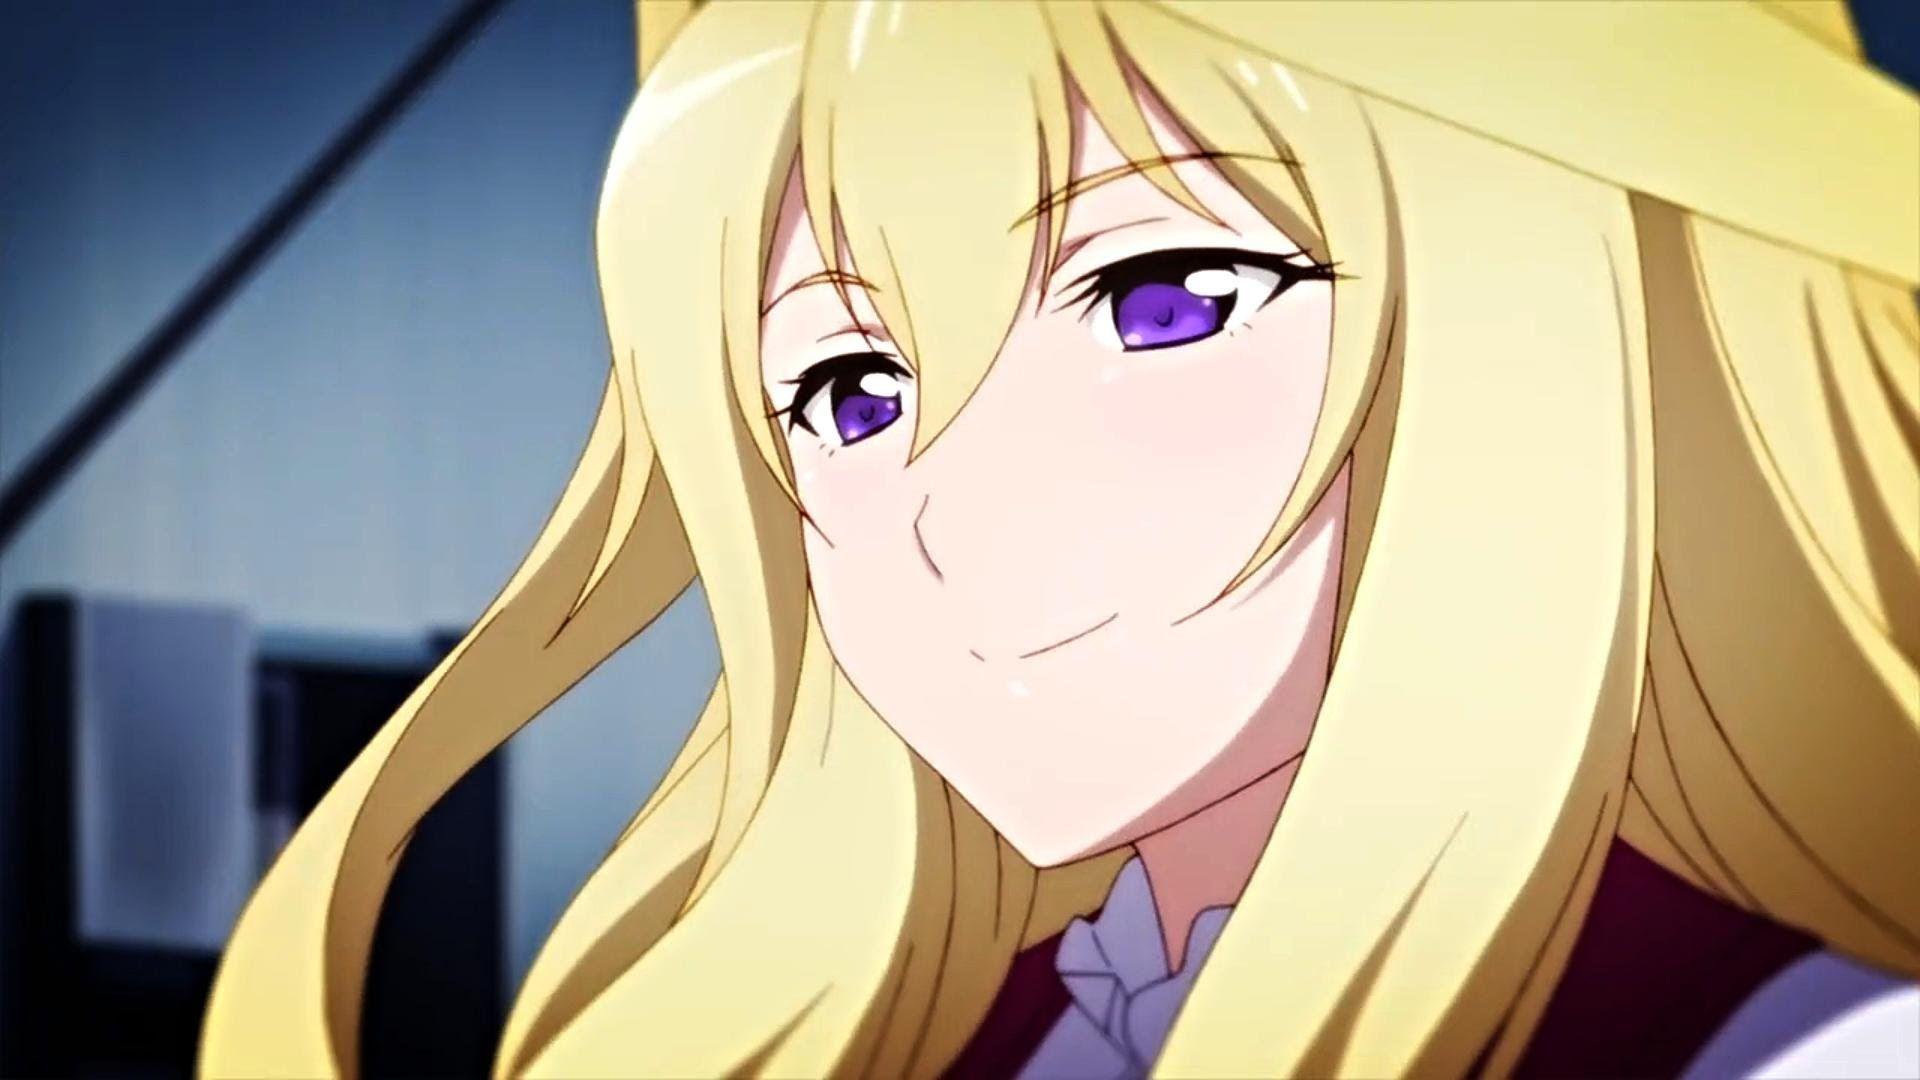 Claudia Enfield | Aurora sleeping beauty, Anime, Disney